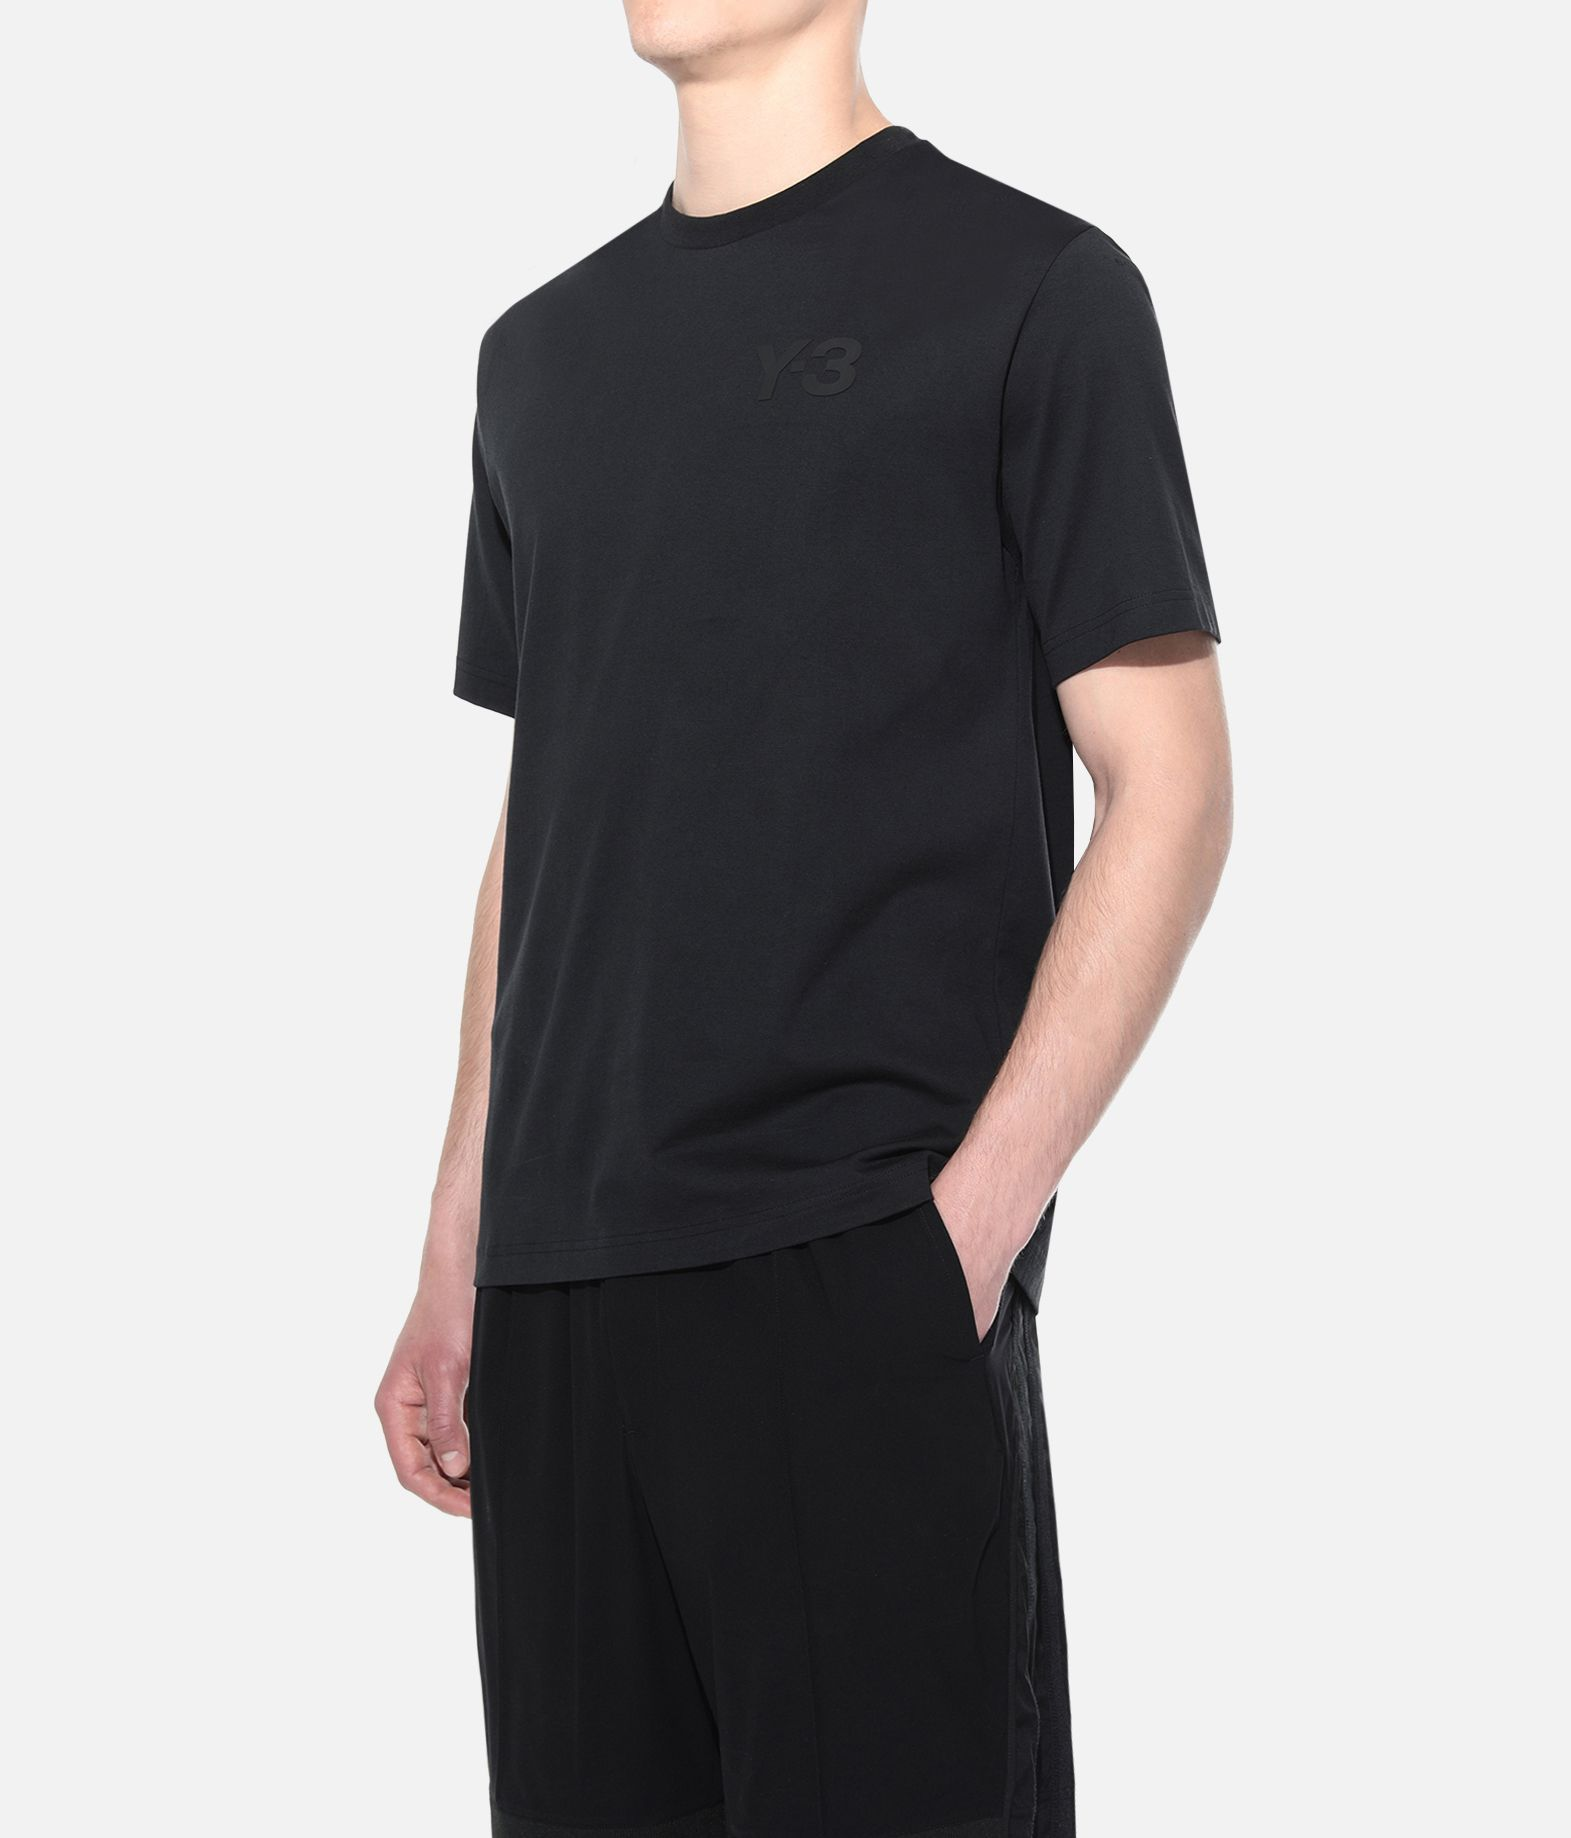 Y-3 Y-3 Logo Tee T-shirt maniche corte Uomo e